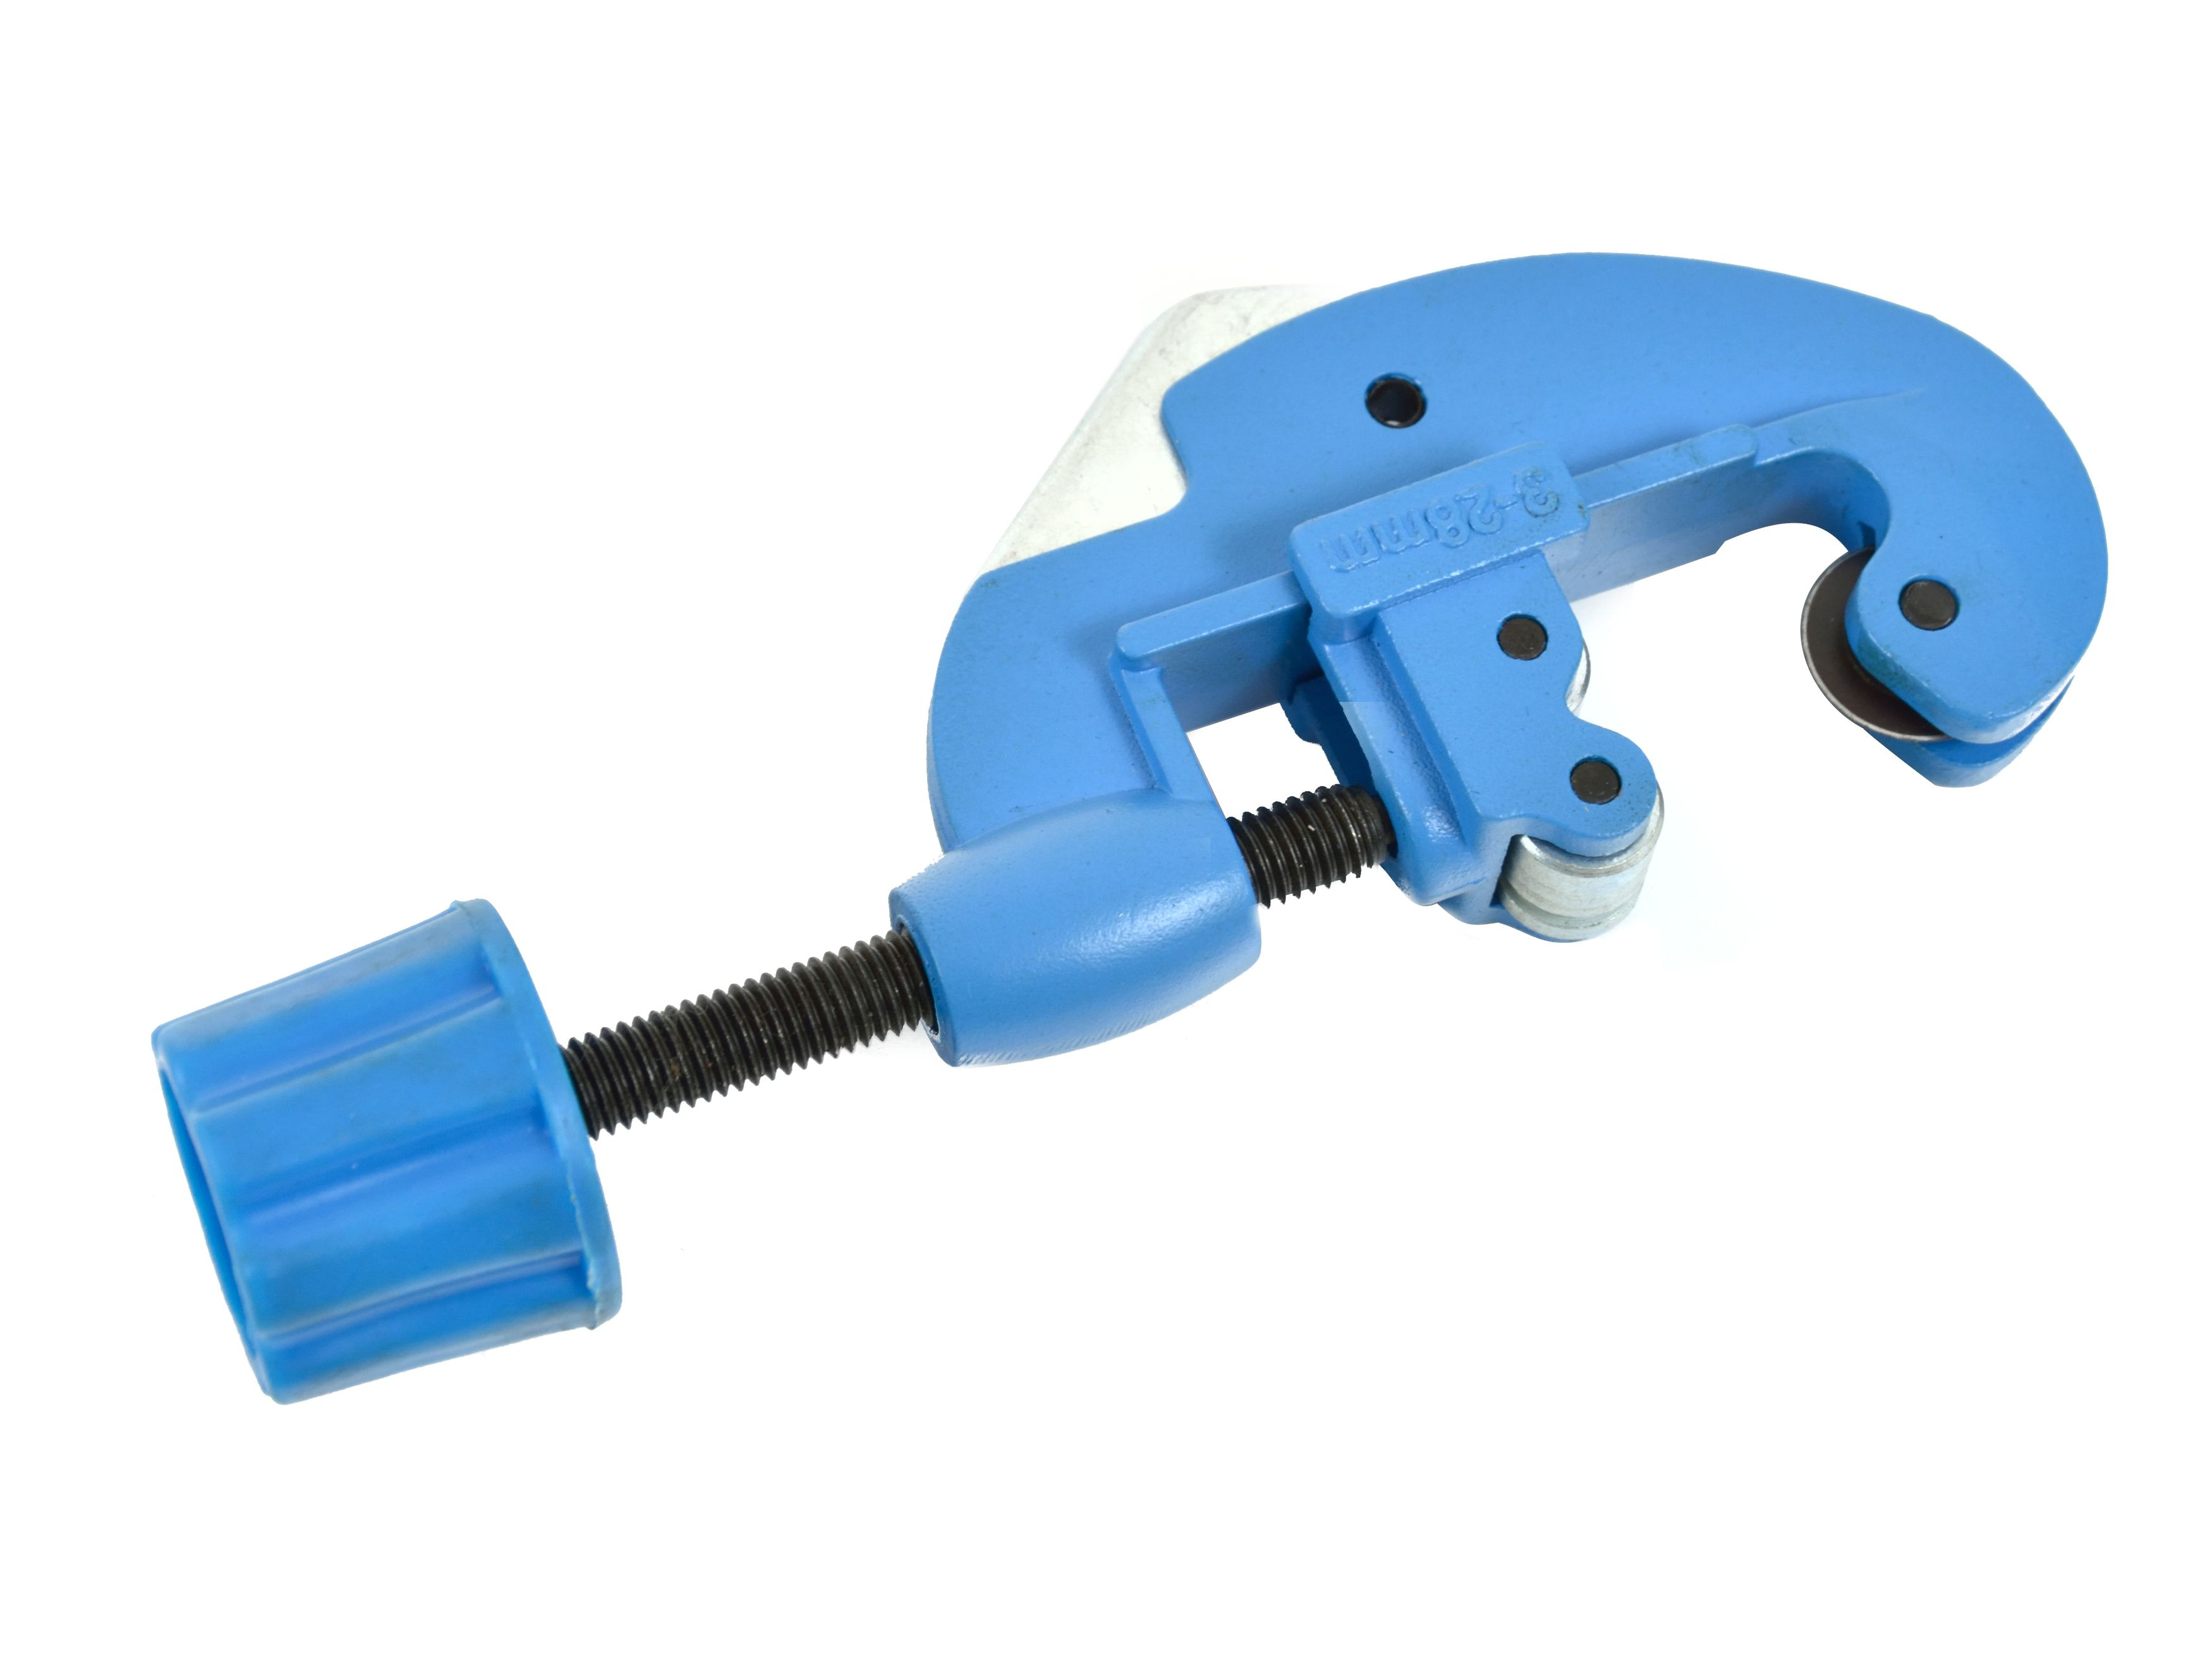 GEKO G01372 Řezač trubek s odhrotovačem, 3-28mm